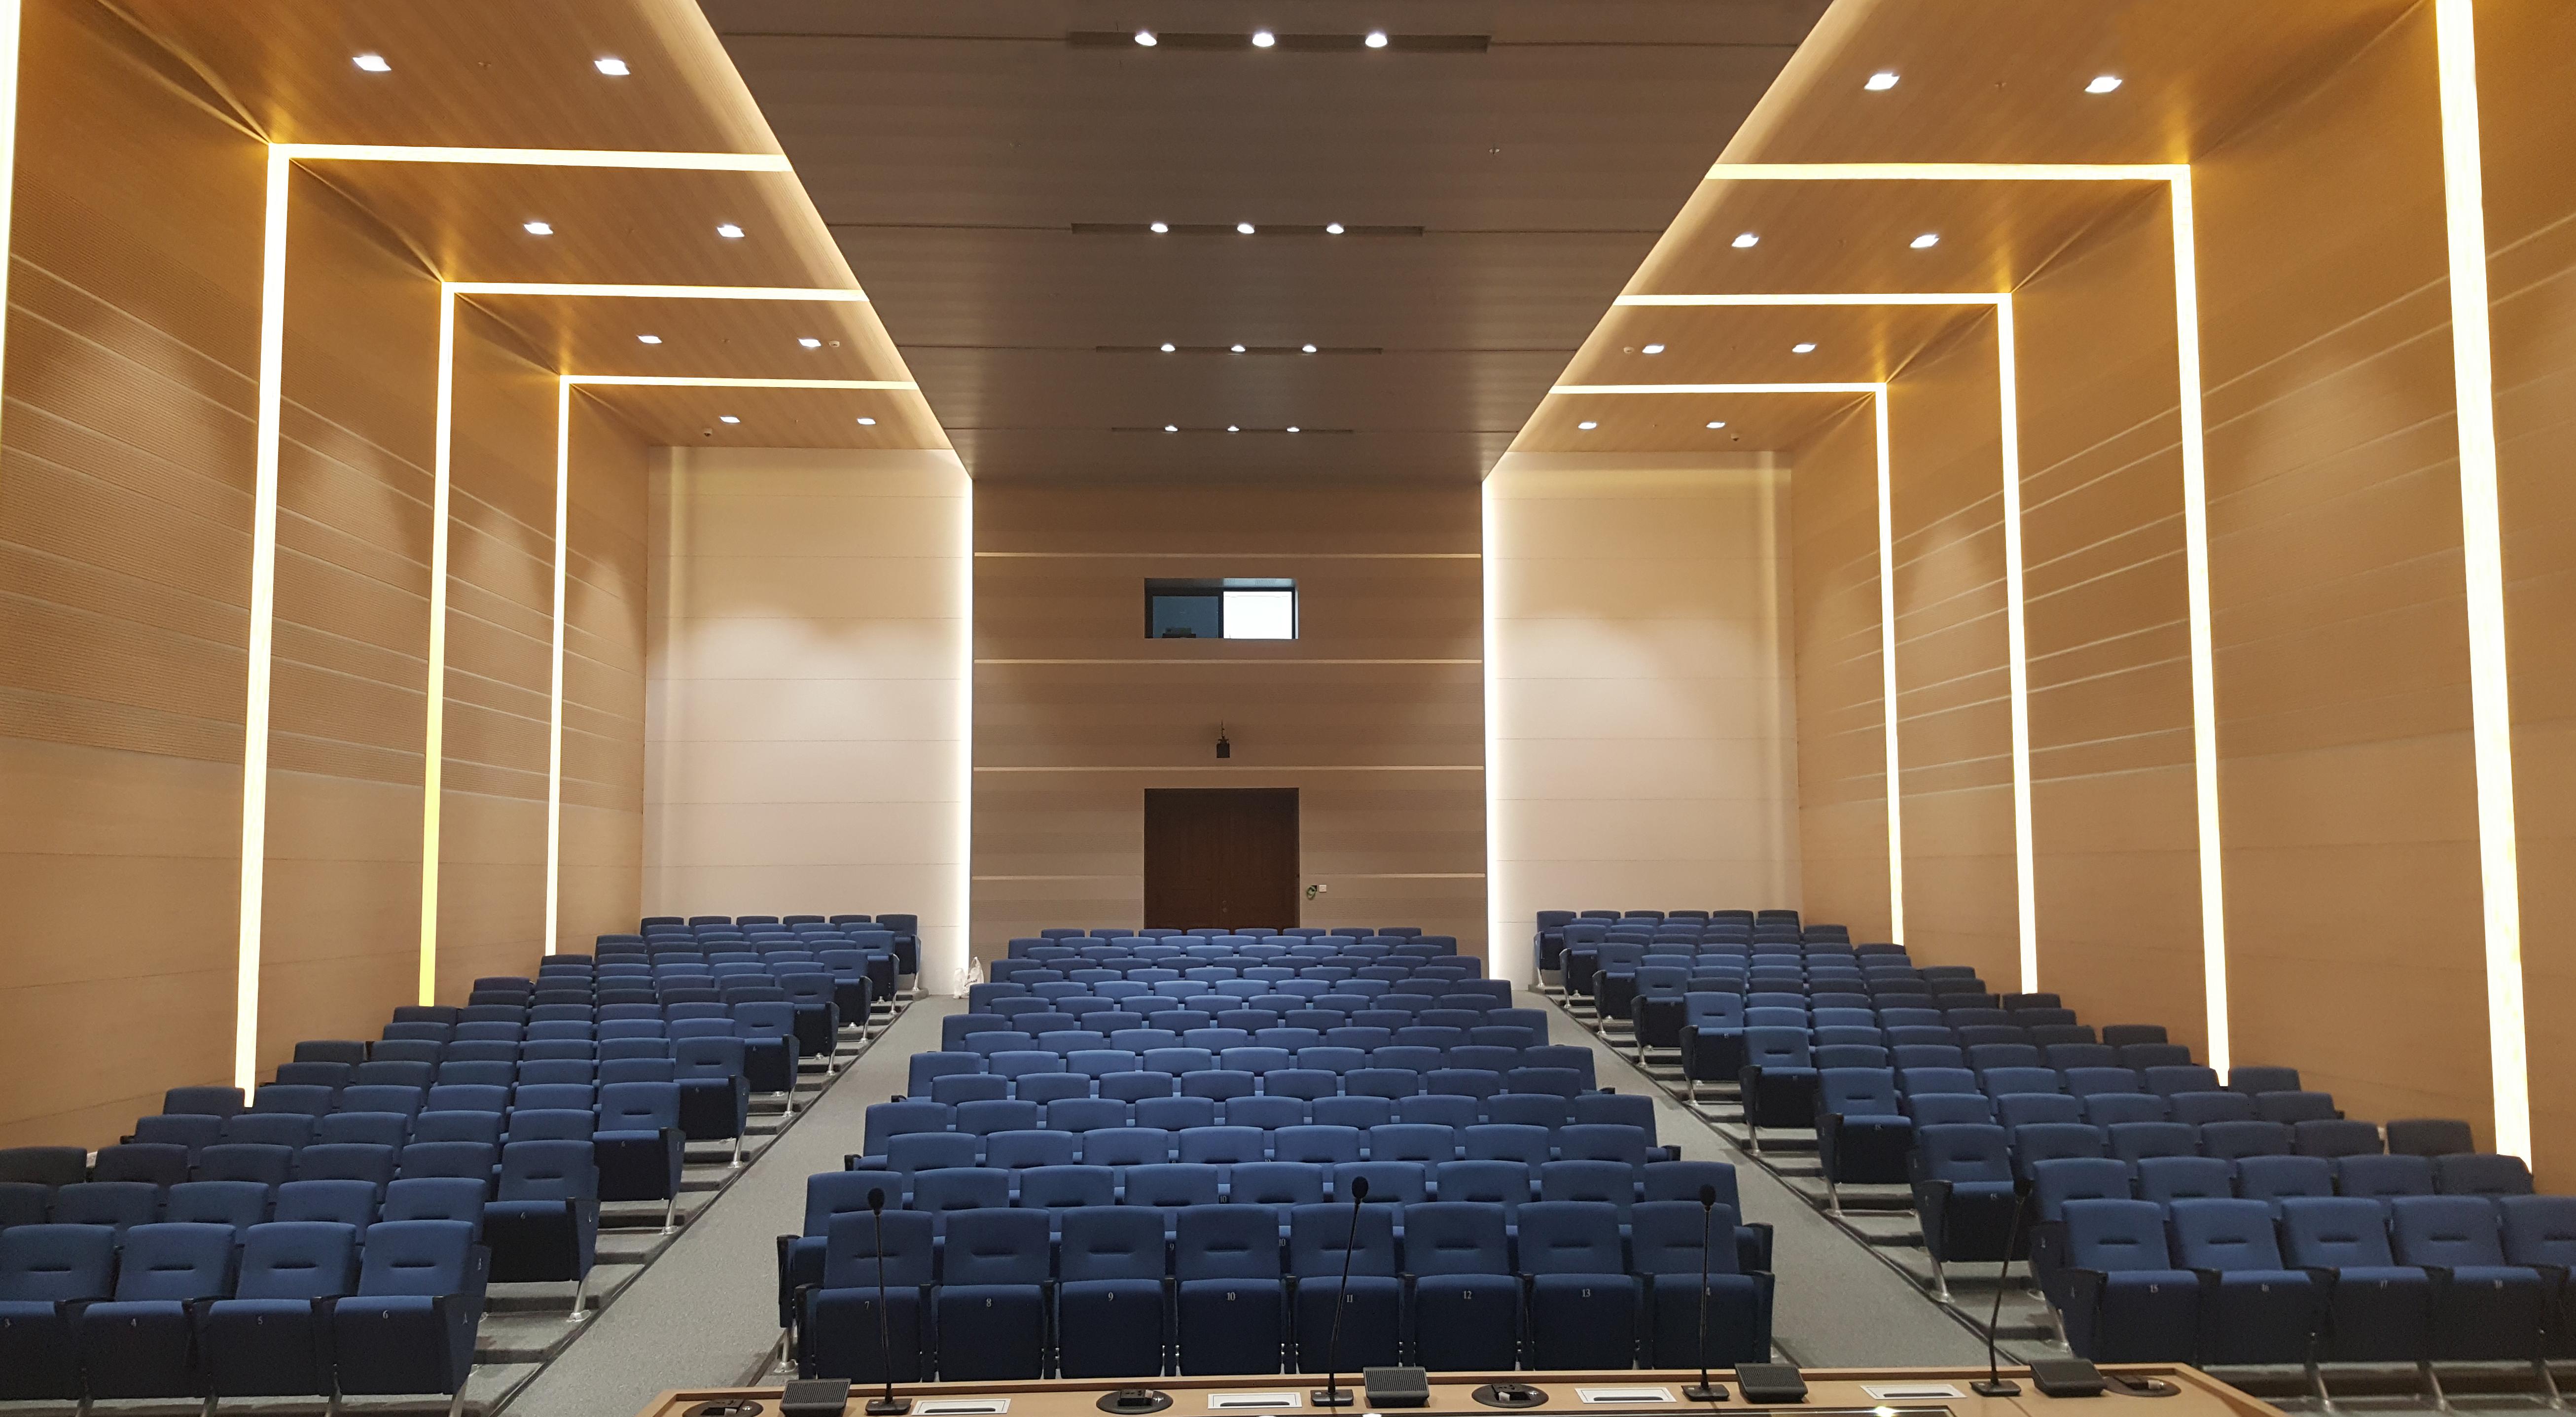 DASMAN BILINGUAL SCHOOL – KUWAIT CITY, KUWAIT